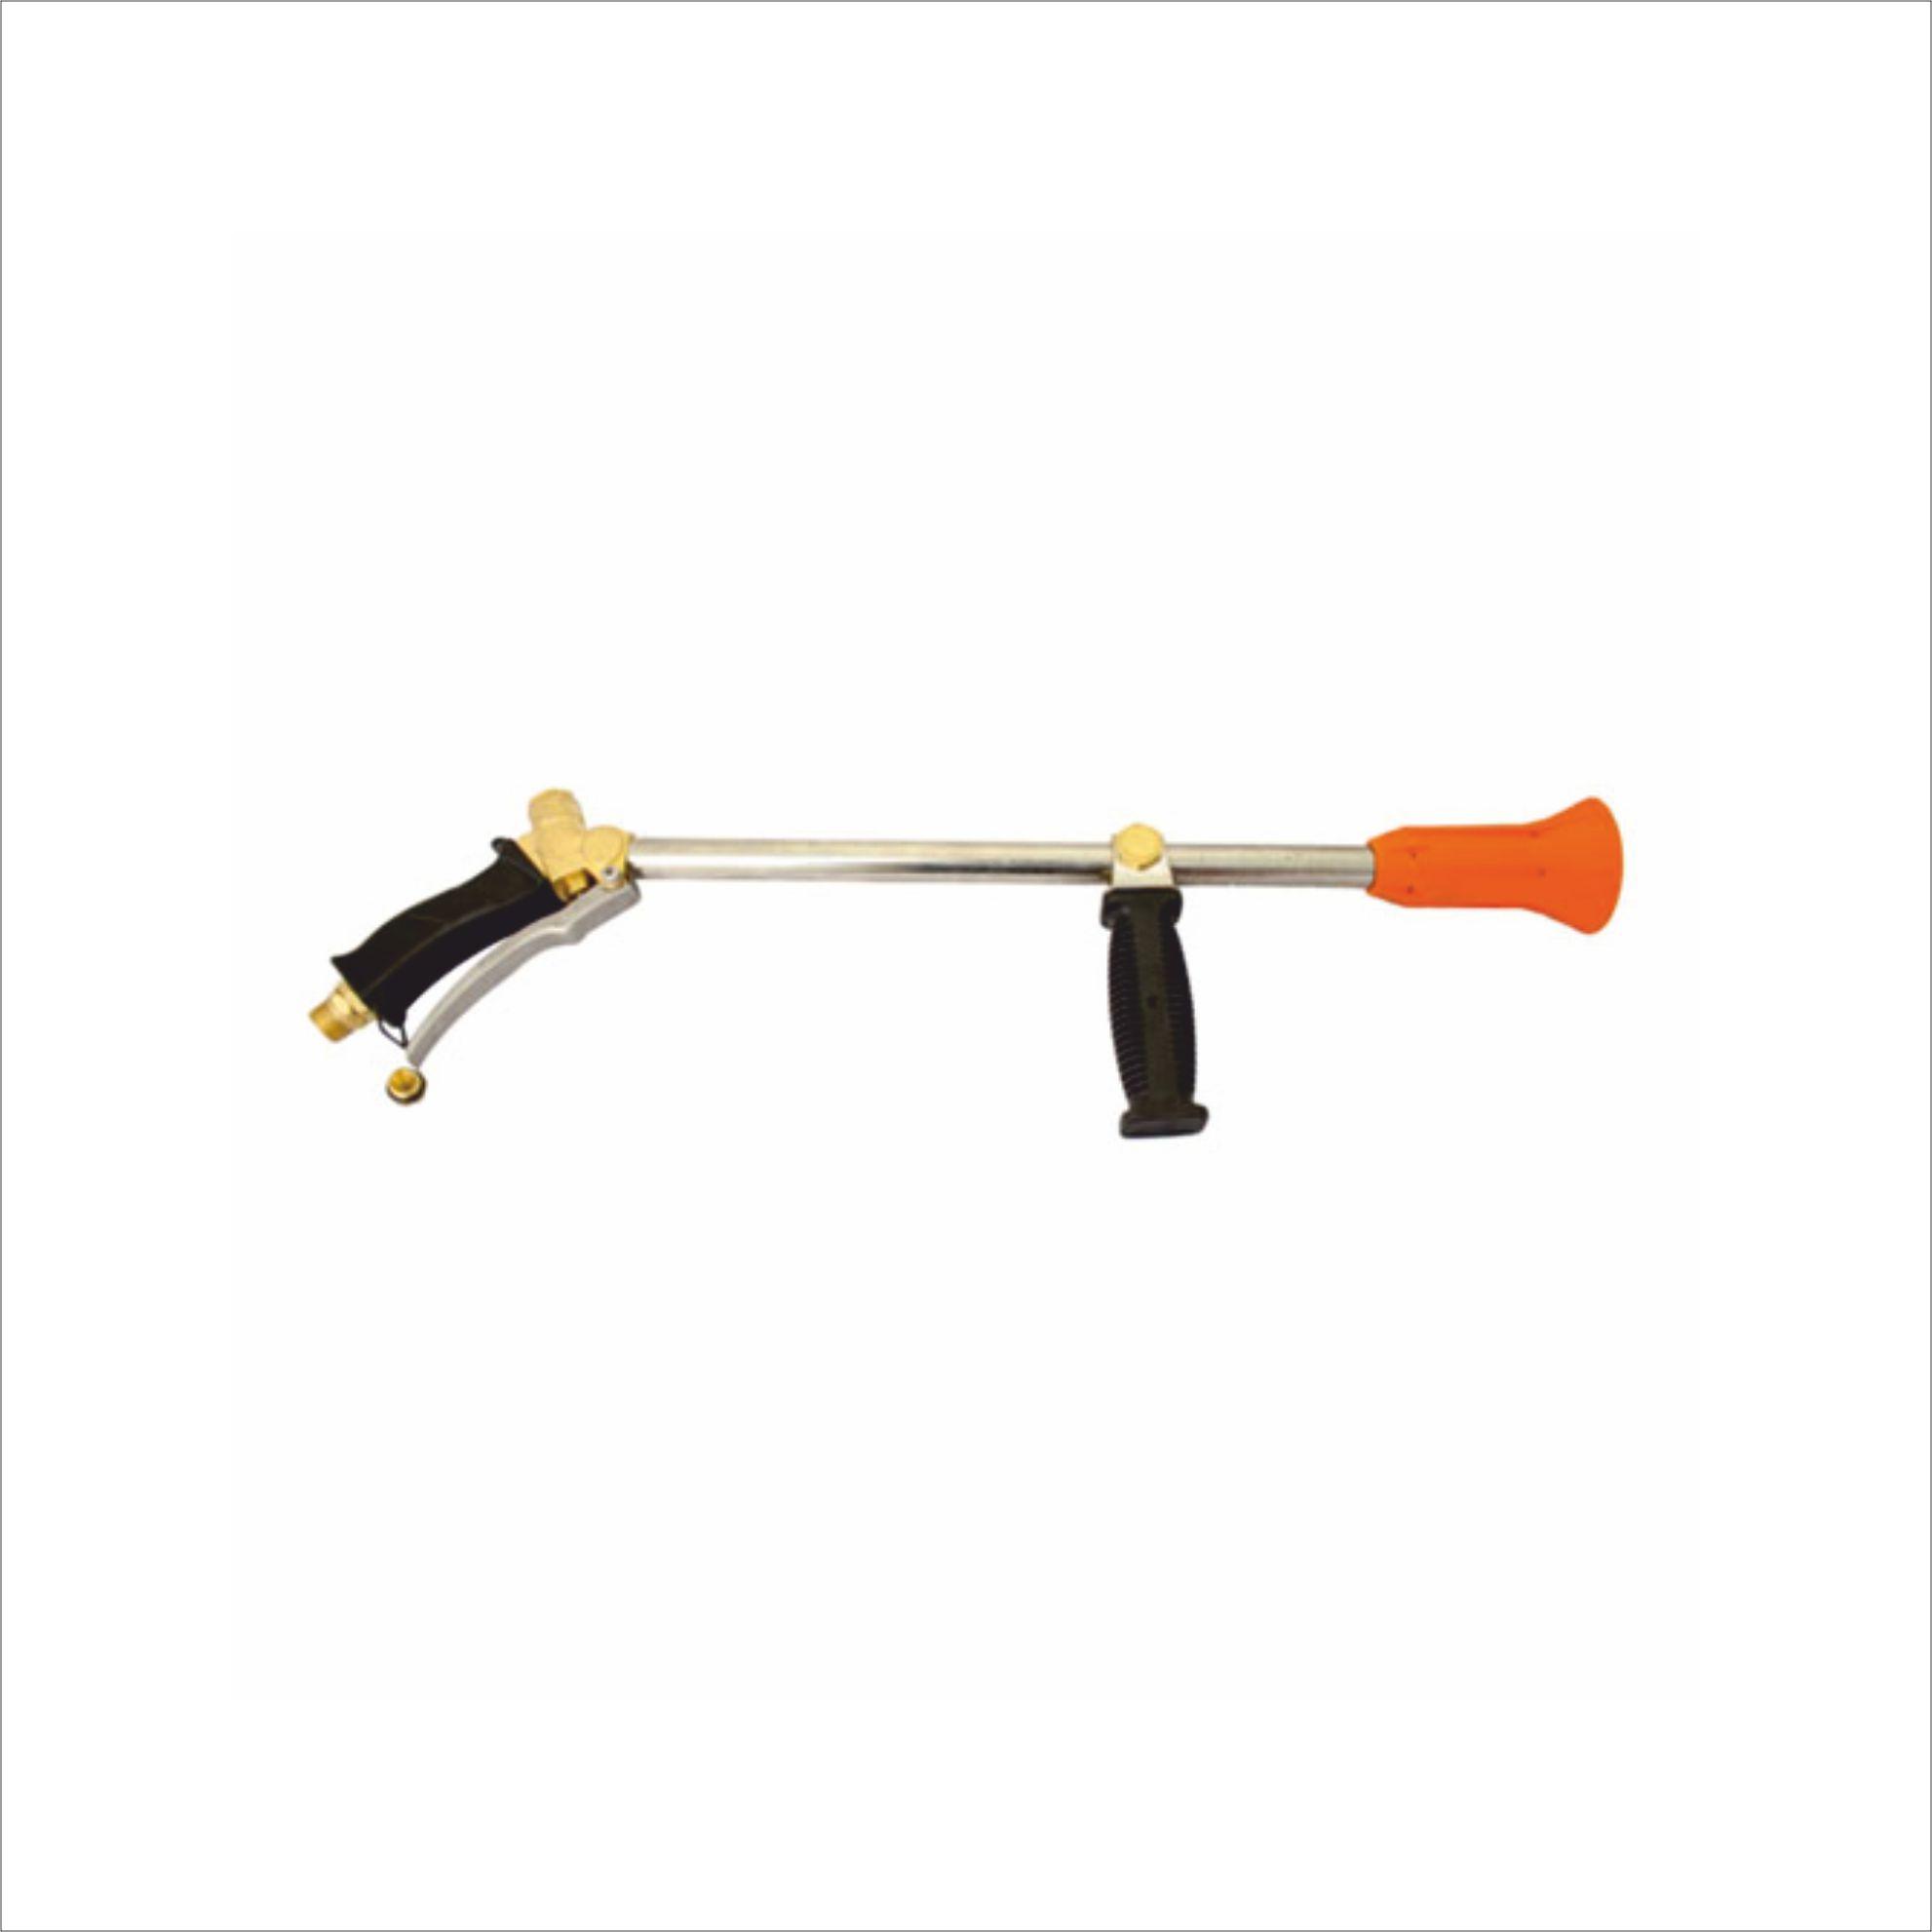 LONG TYPE TRIGGER SPRAY GUN